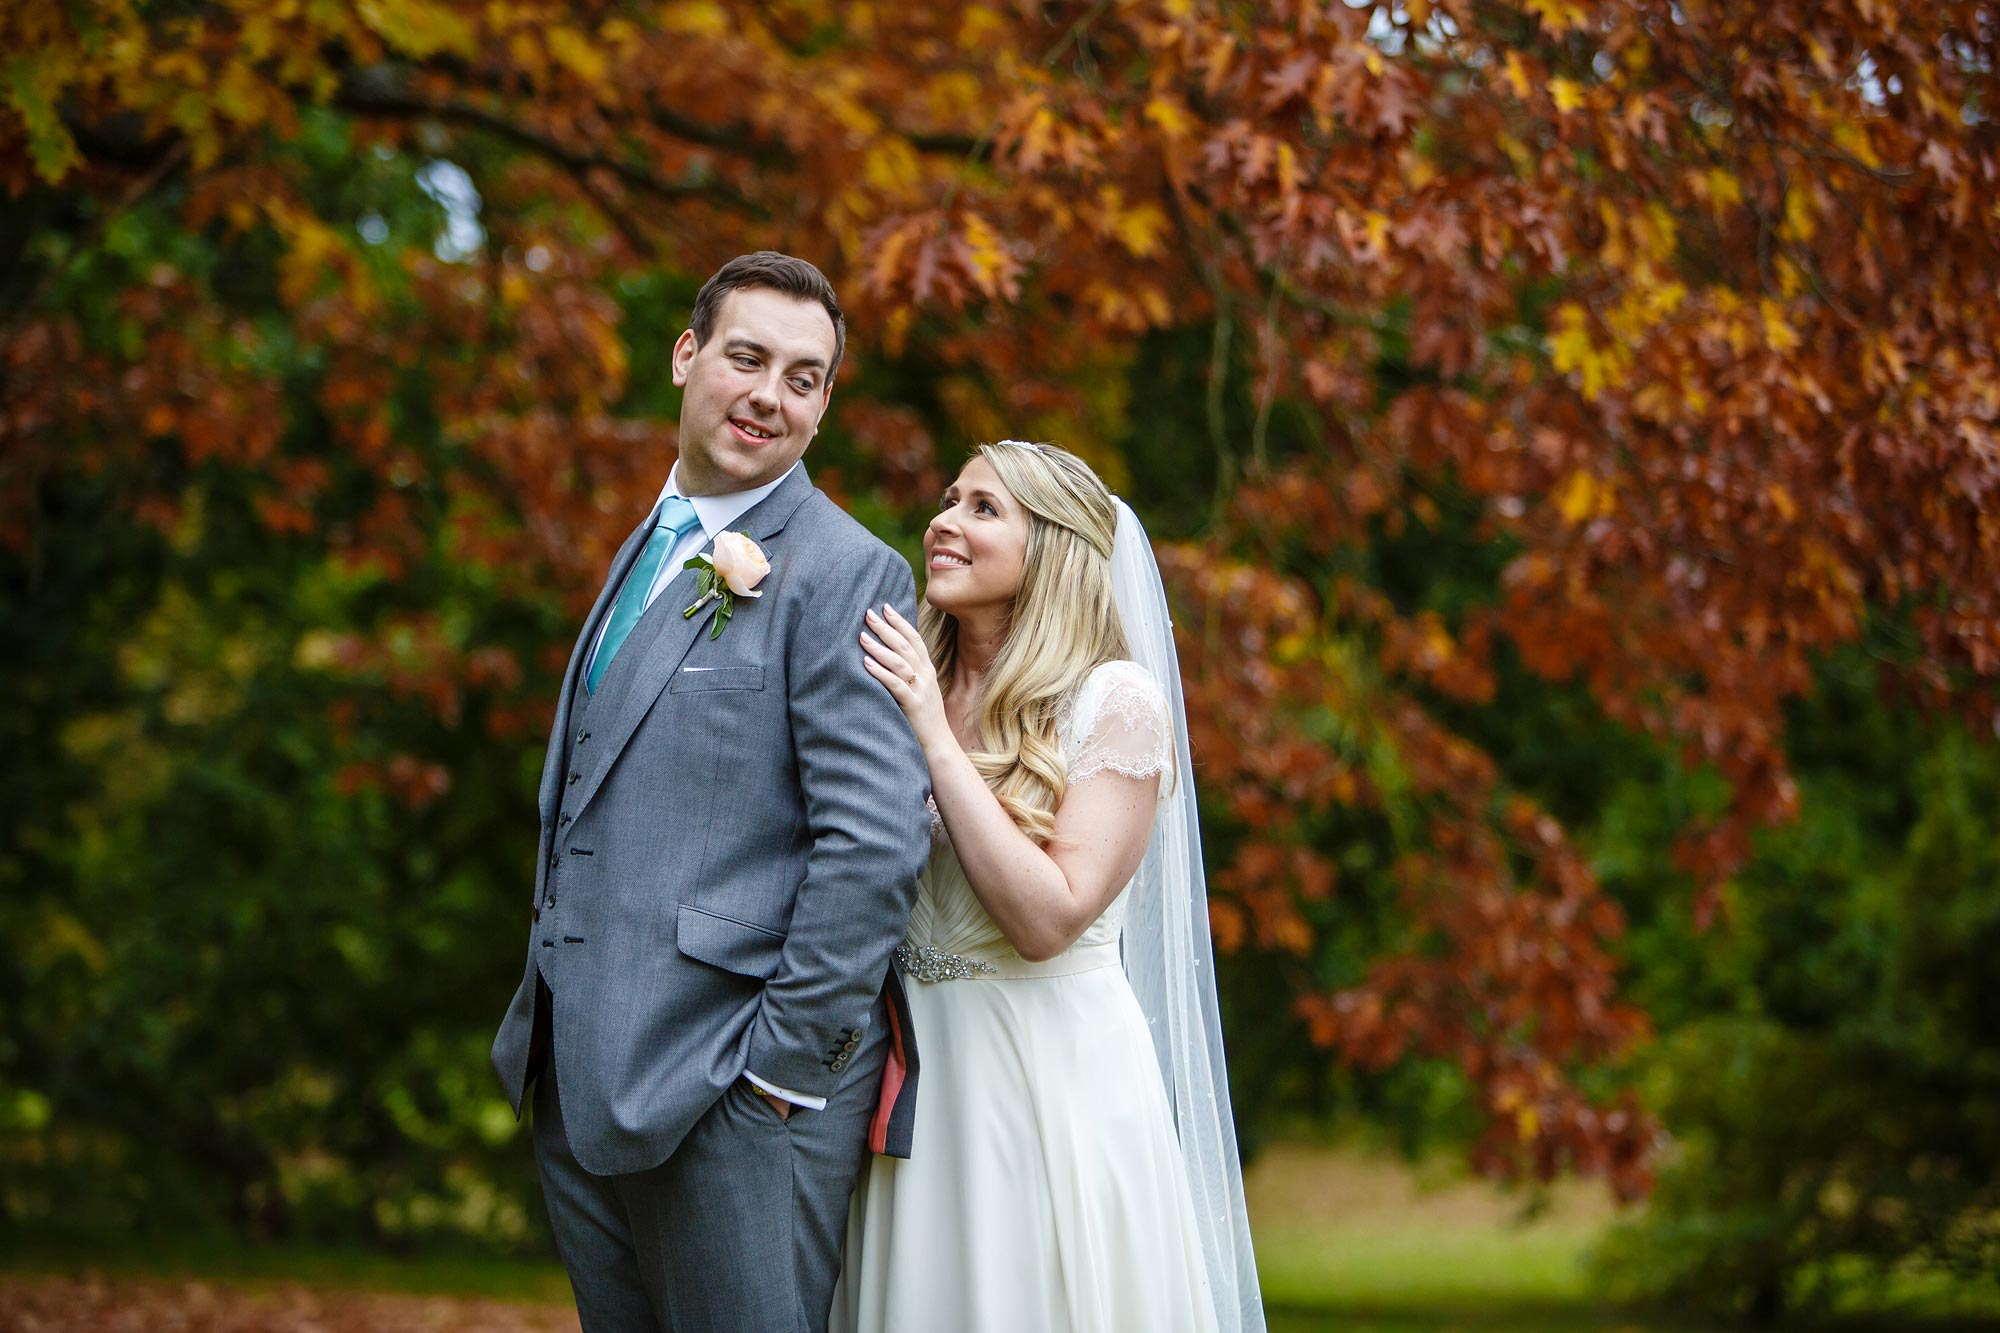 Botleys Mansion autumn wedding